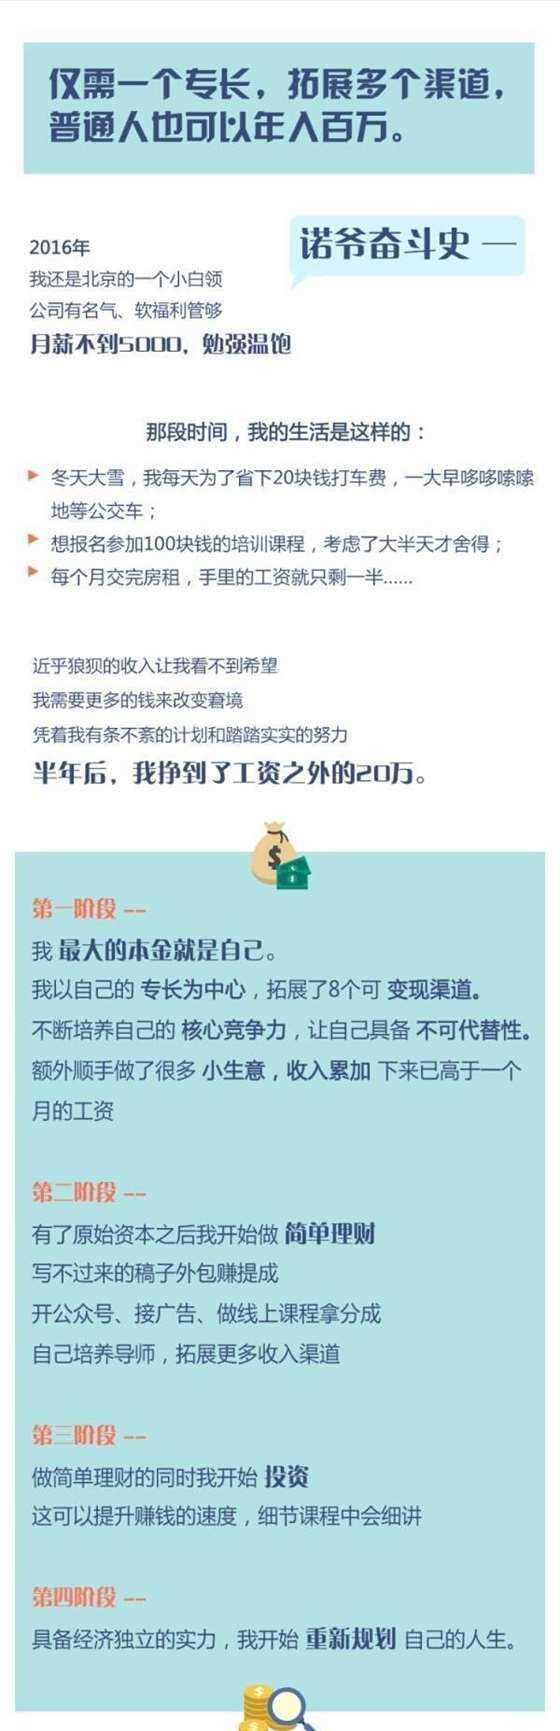 http://www.huodongxing.com/file/20160530/5092341960349/393177870248488.jpg